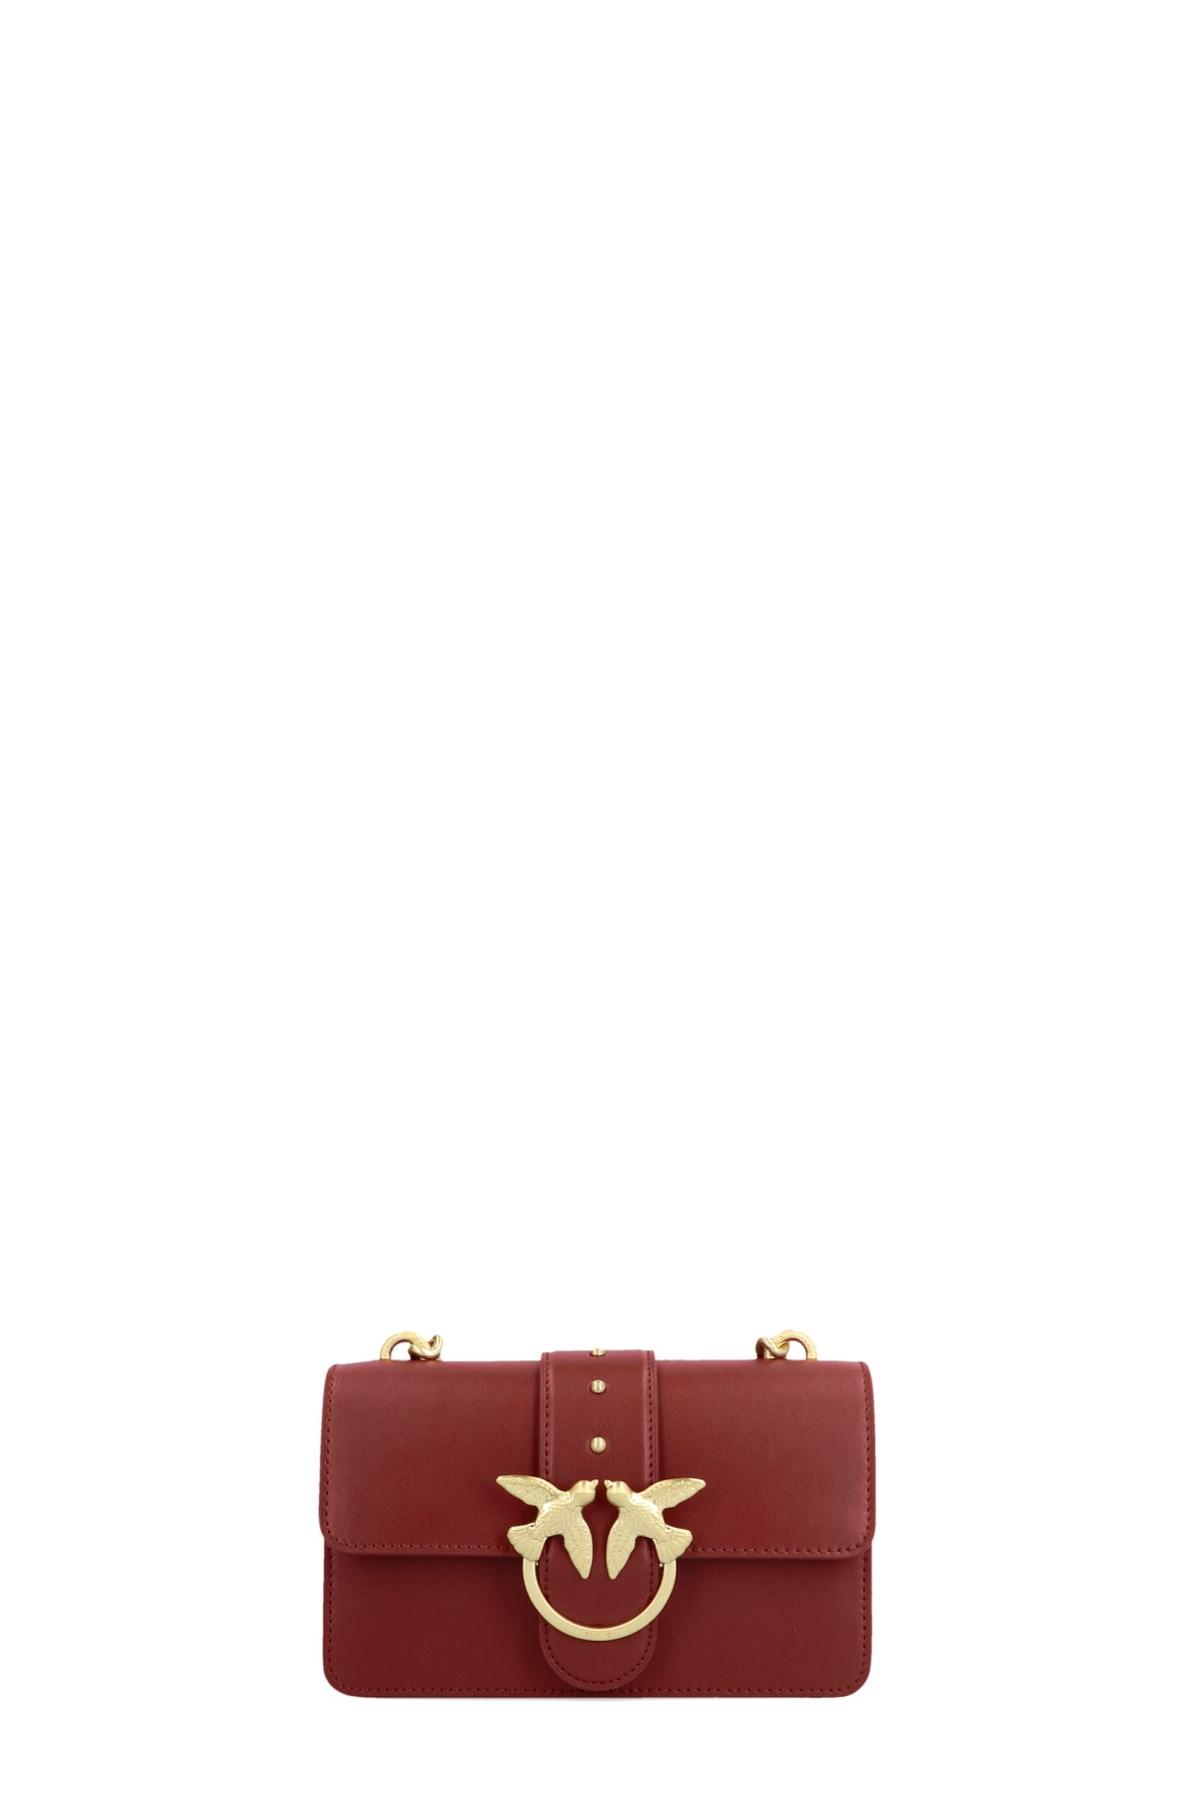 Women Woolen Messenger Shoulder Bags Mini Shopping Totes Flap Chain Handbag SS6